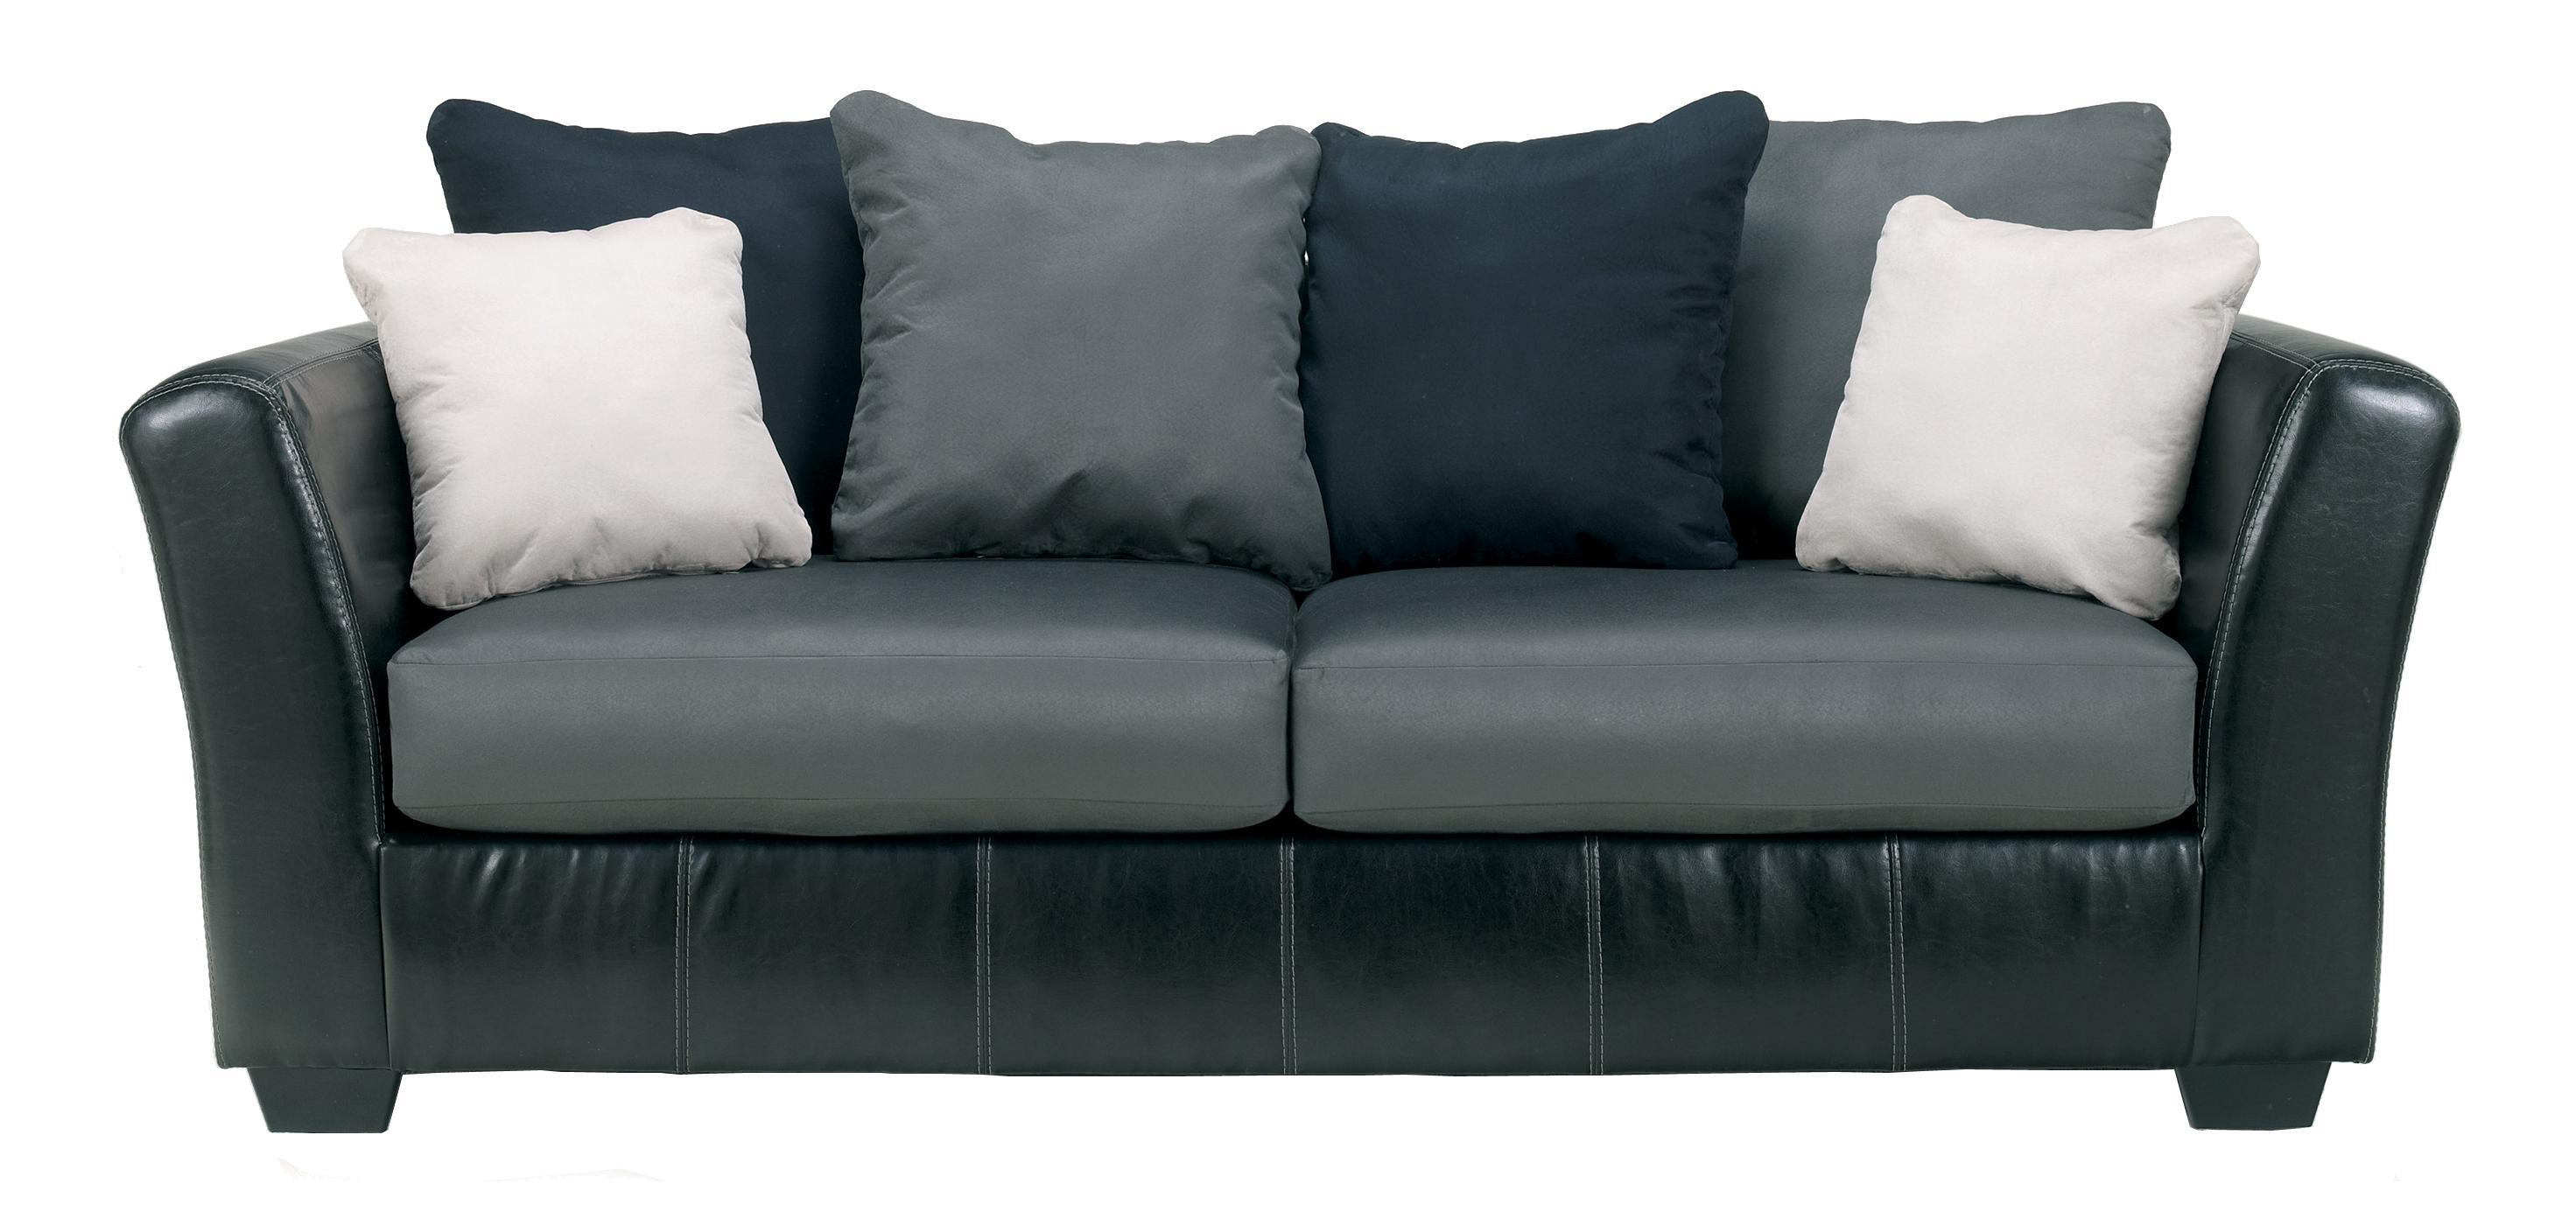 Ashley/Benchcraft Masoli - Cobblestone Sofa - Item Number: 1420038